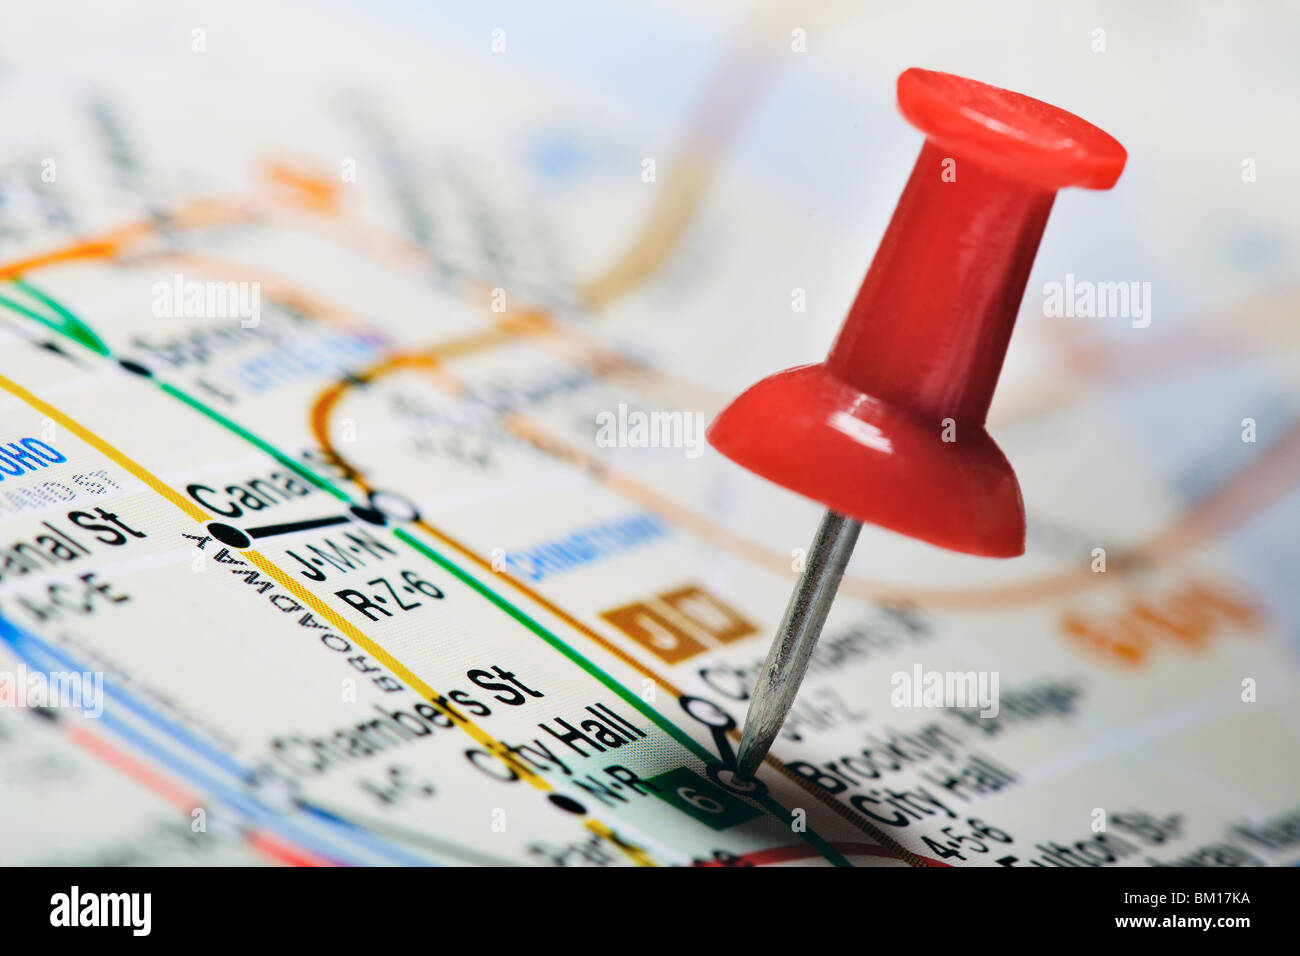 New York Subway Map Red.Thumbtack In A Subway Map New York Stock Photo 29531470 Alamy